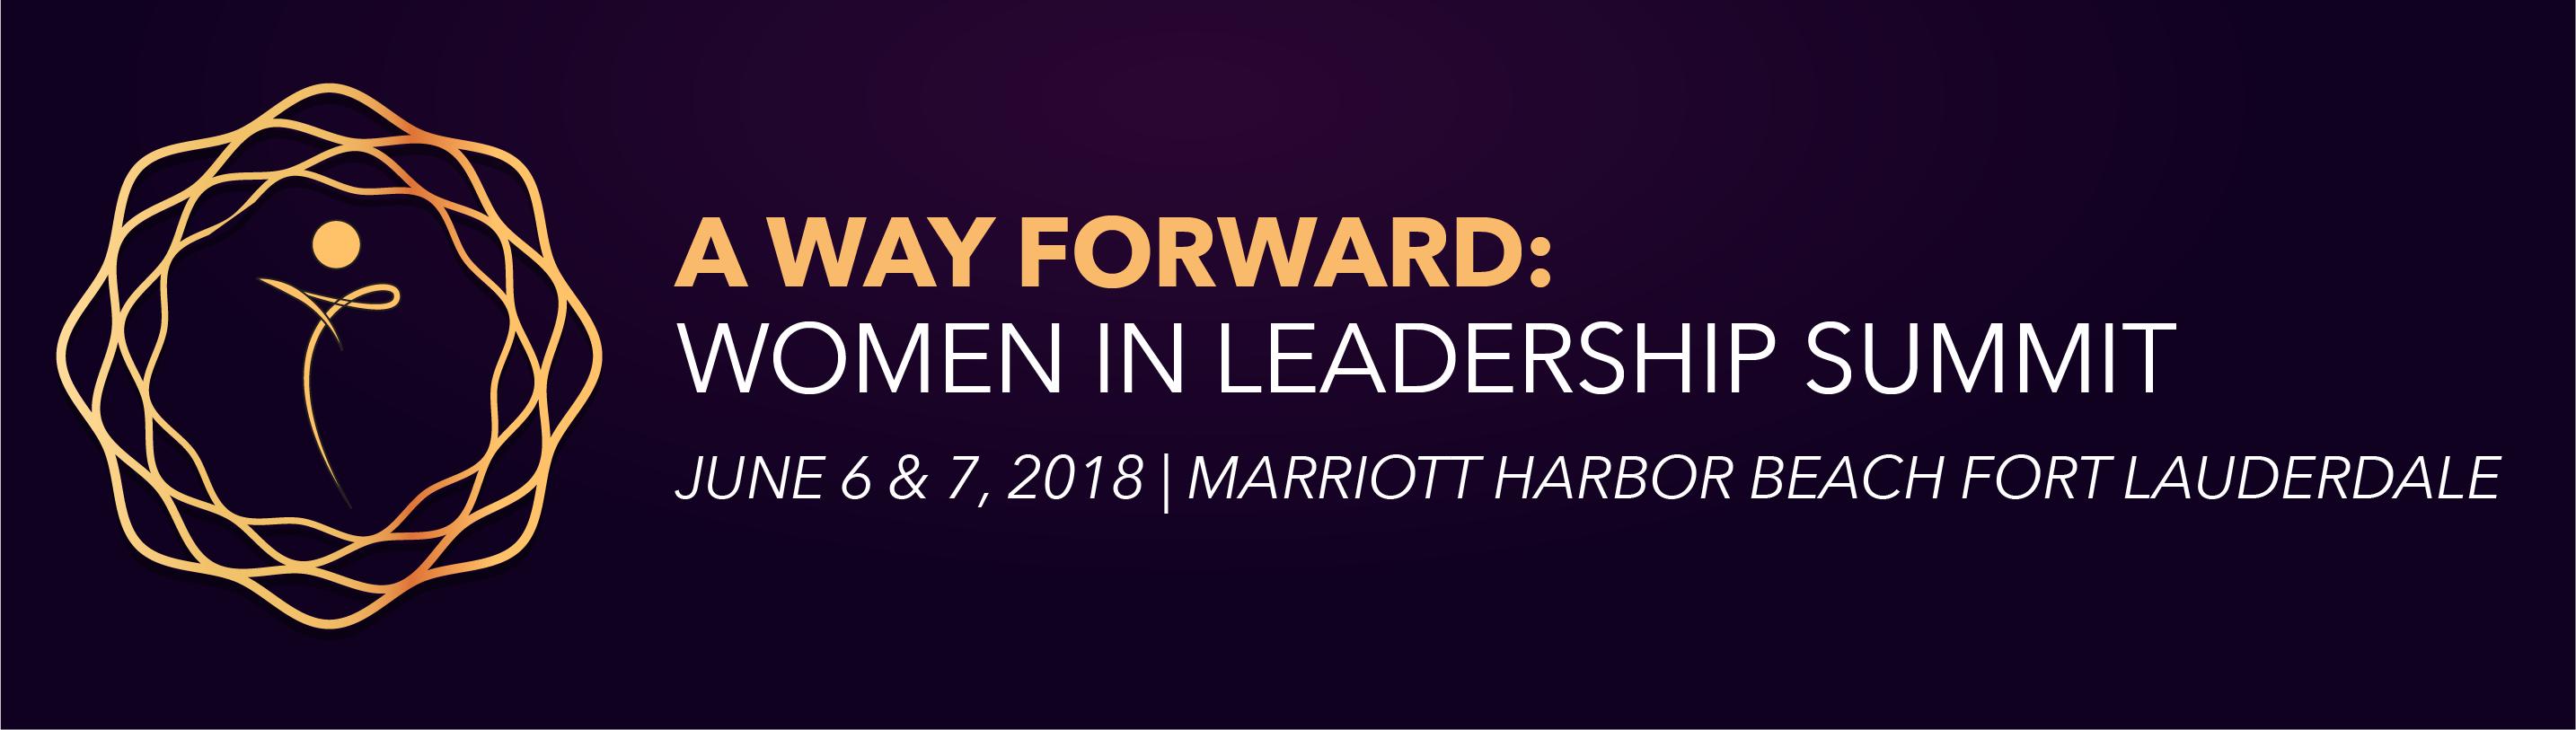 A Way Forward: Women in Leadership Summit 2018